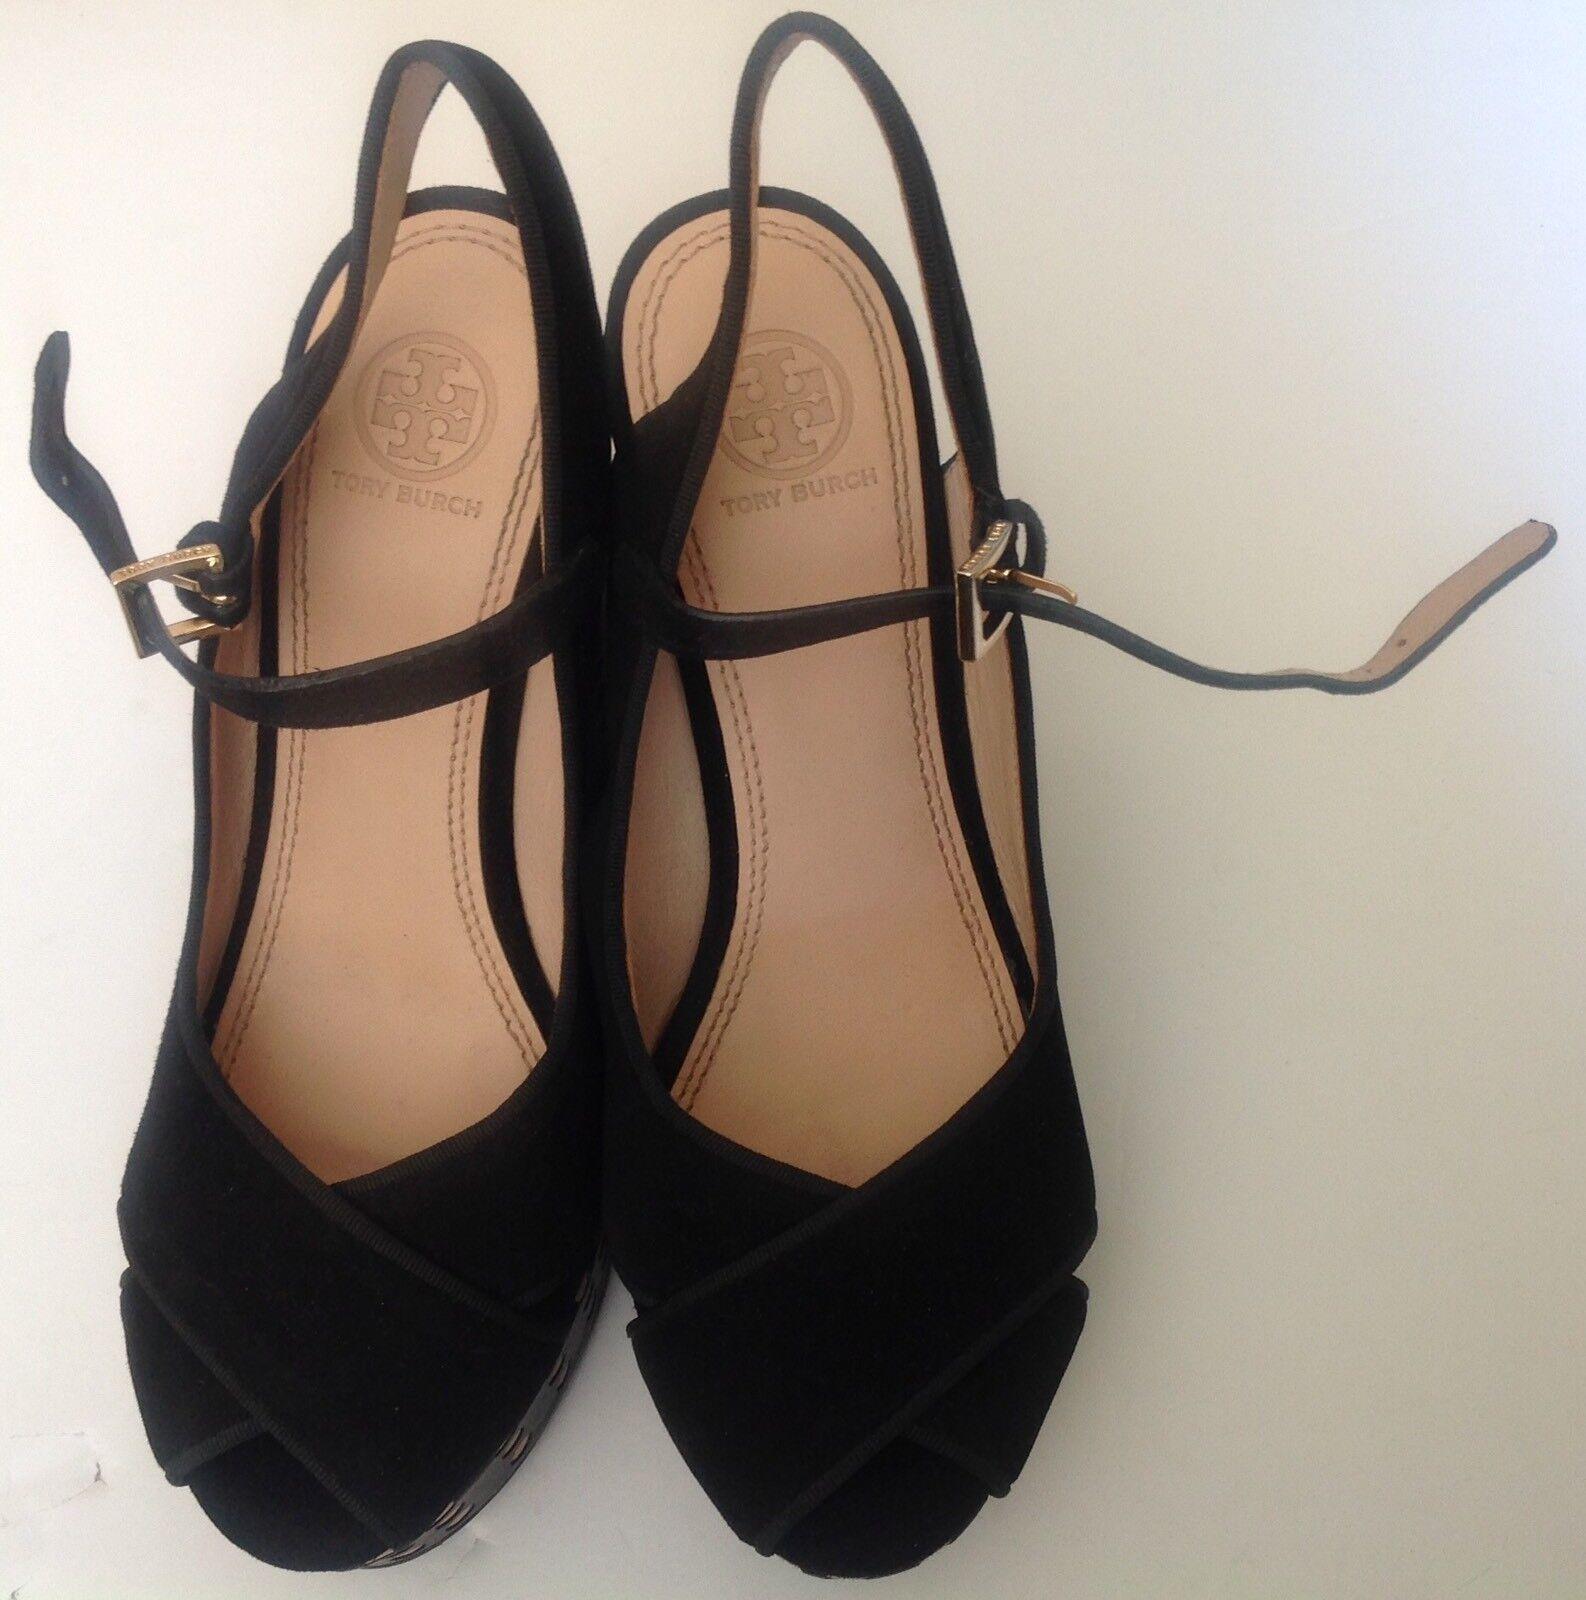 Tory Burch Ollie Cuero Ante Negro lunares sandalia de plataforma cuña de plataforma de Zapatos S.8M 5fad18